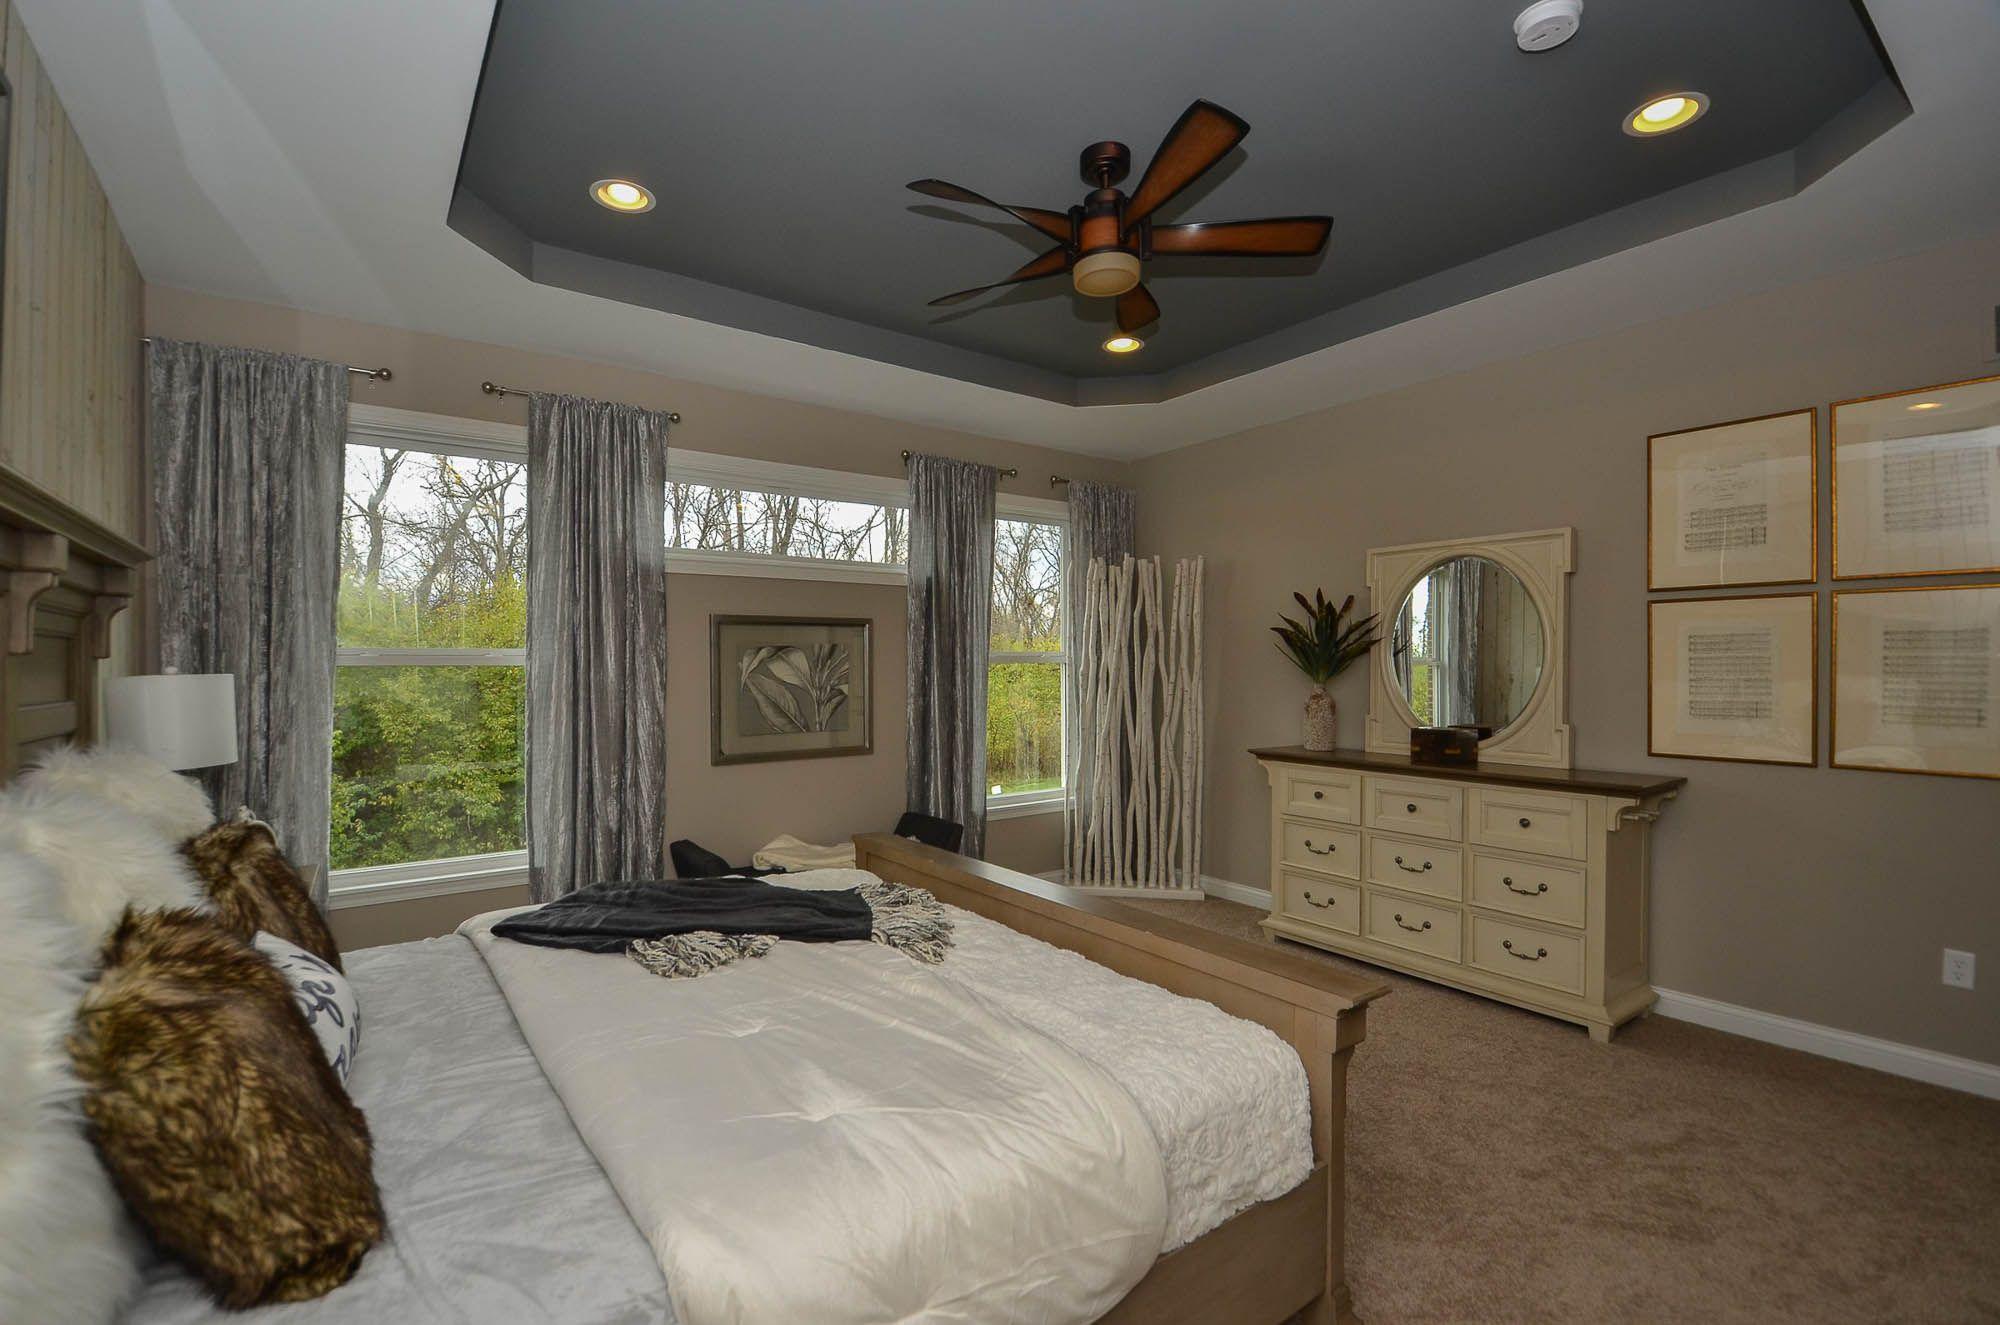 Bedroom featured in the Bayberry By Fischer Homes  in Cincinnati, OH